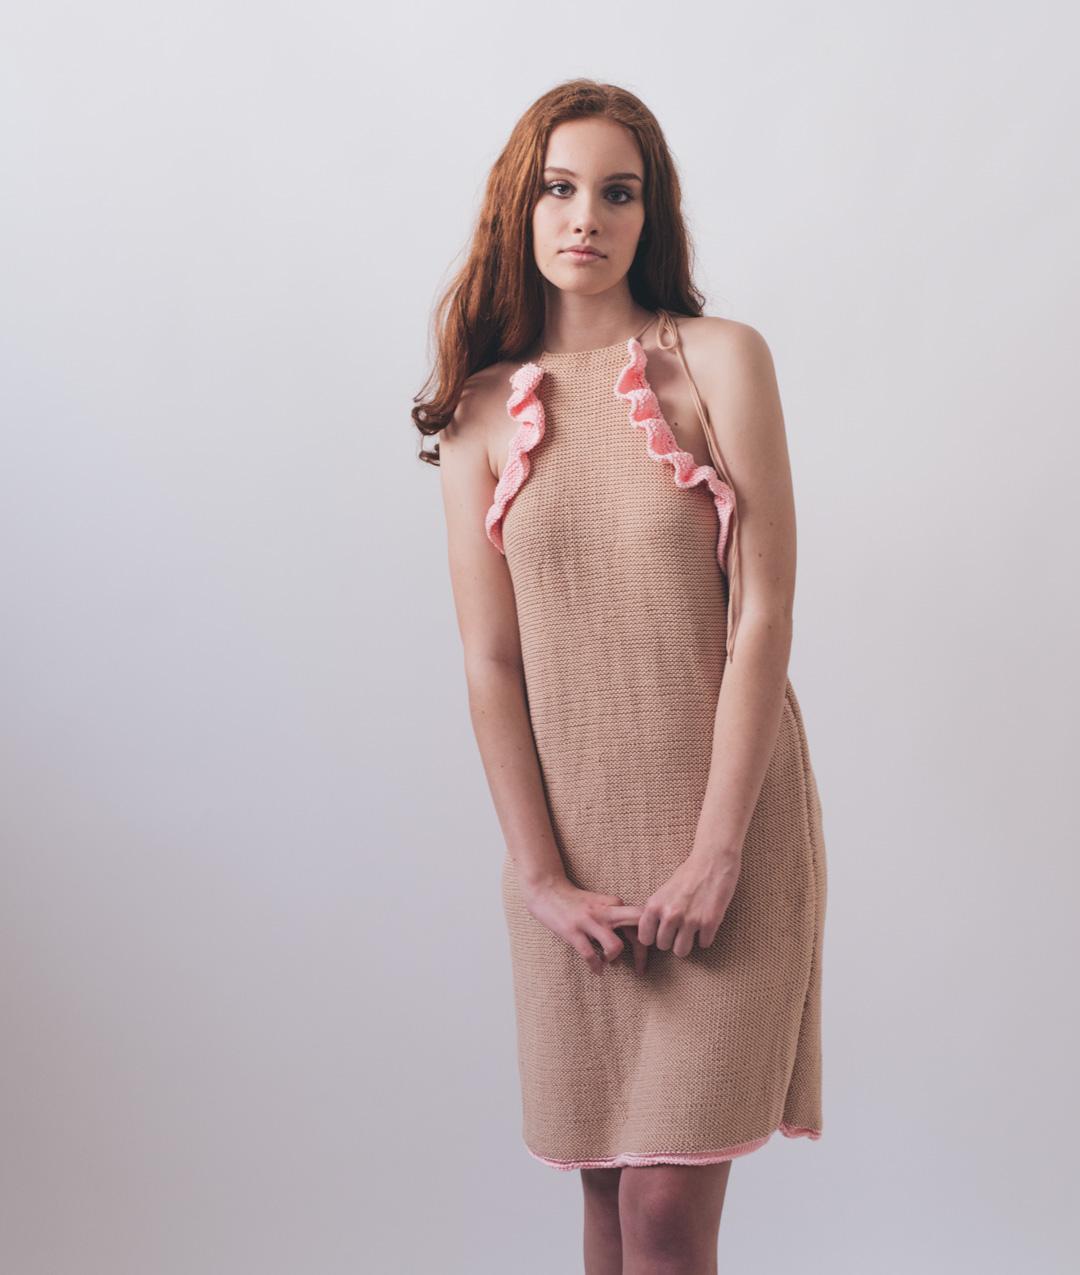 Dress - Cotton - POSITANO DRESS - 1